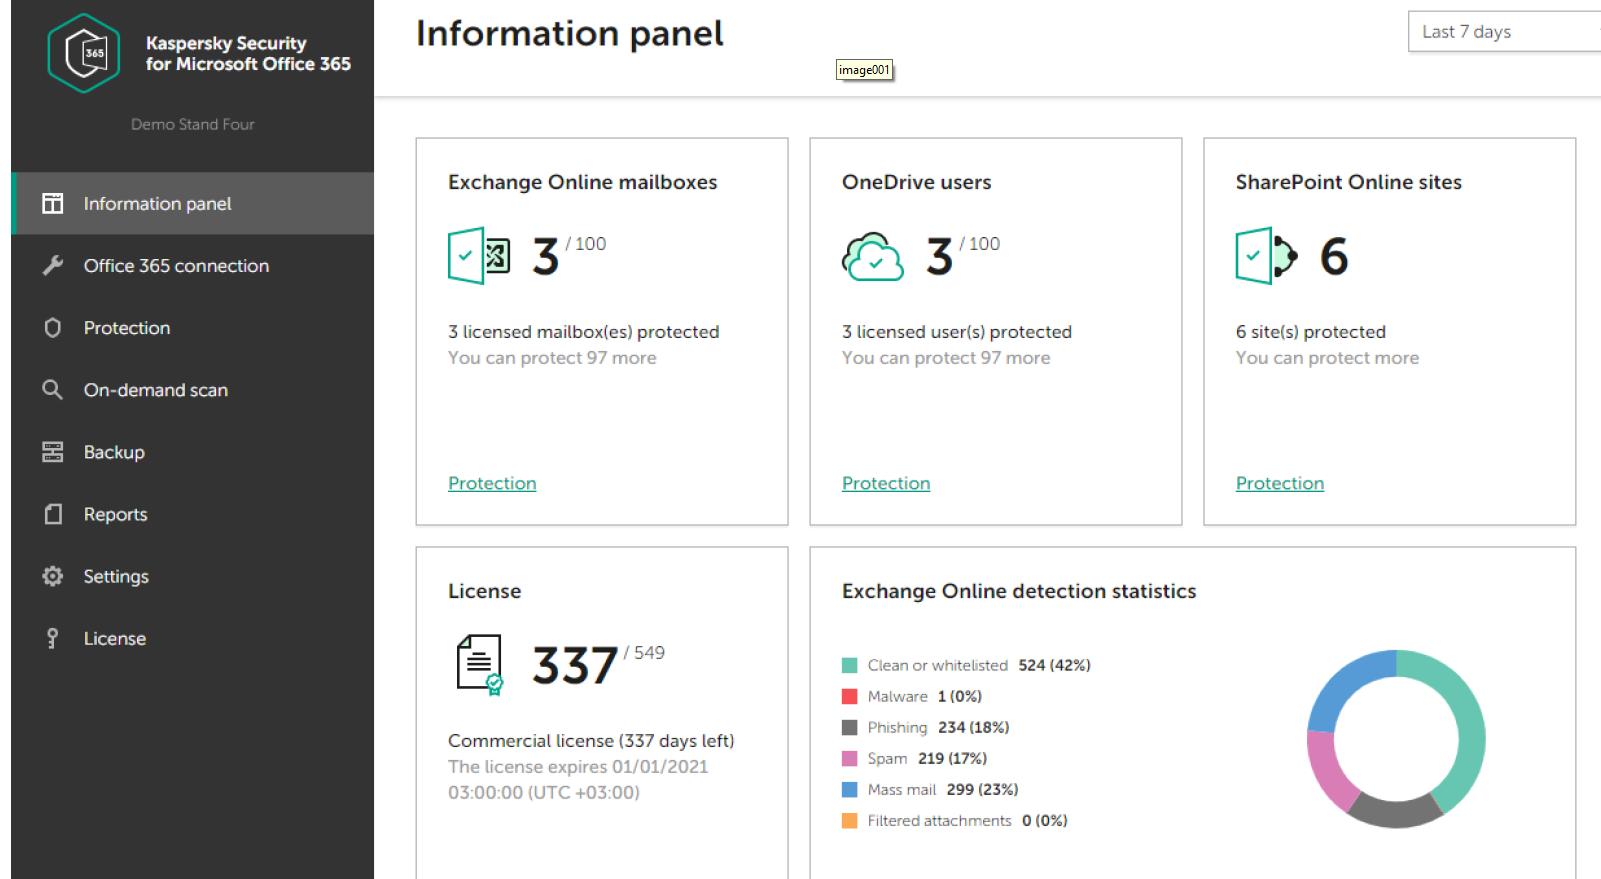 Kaspersky_KSO365 info panel